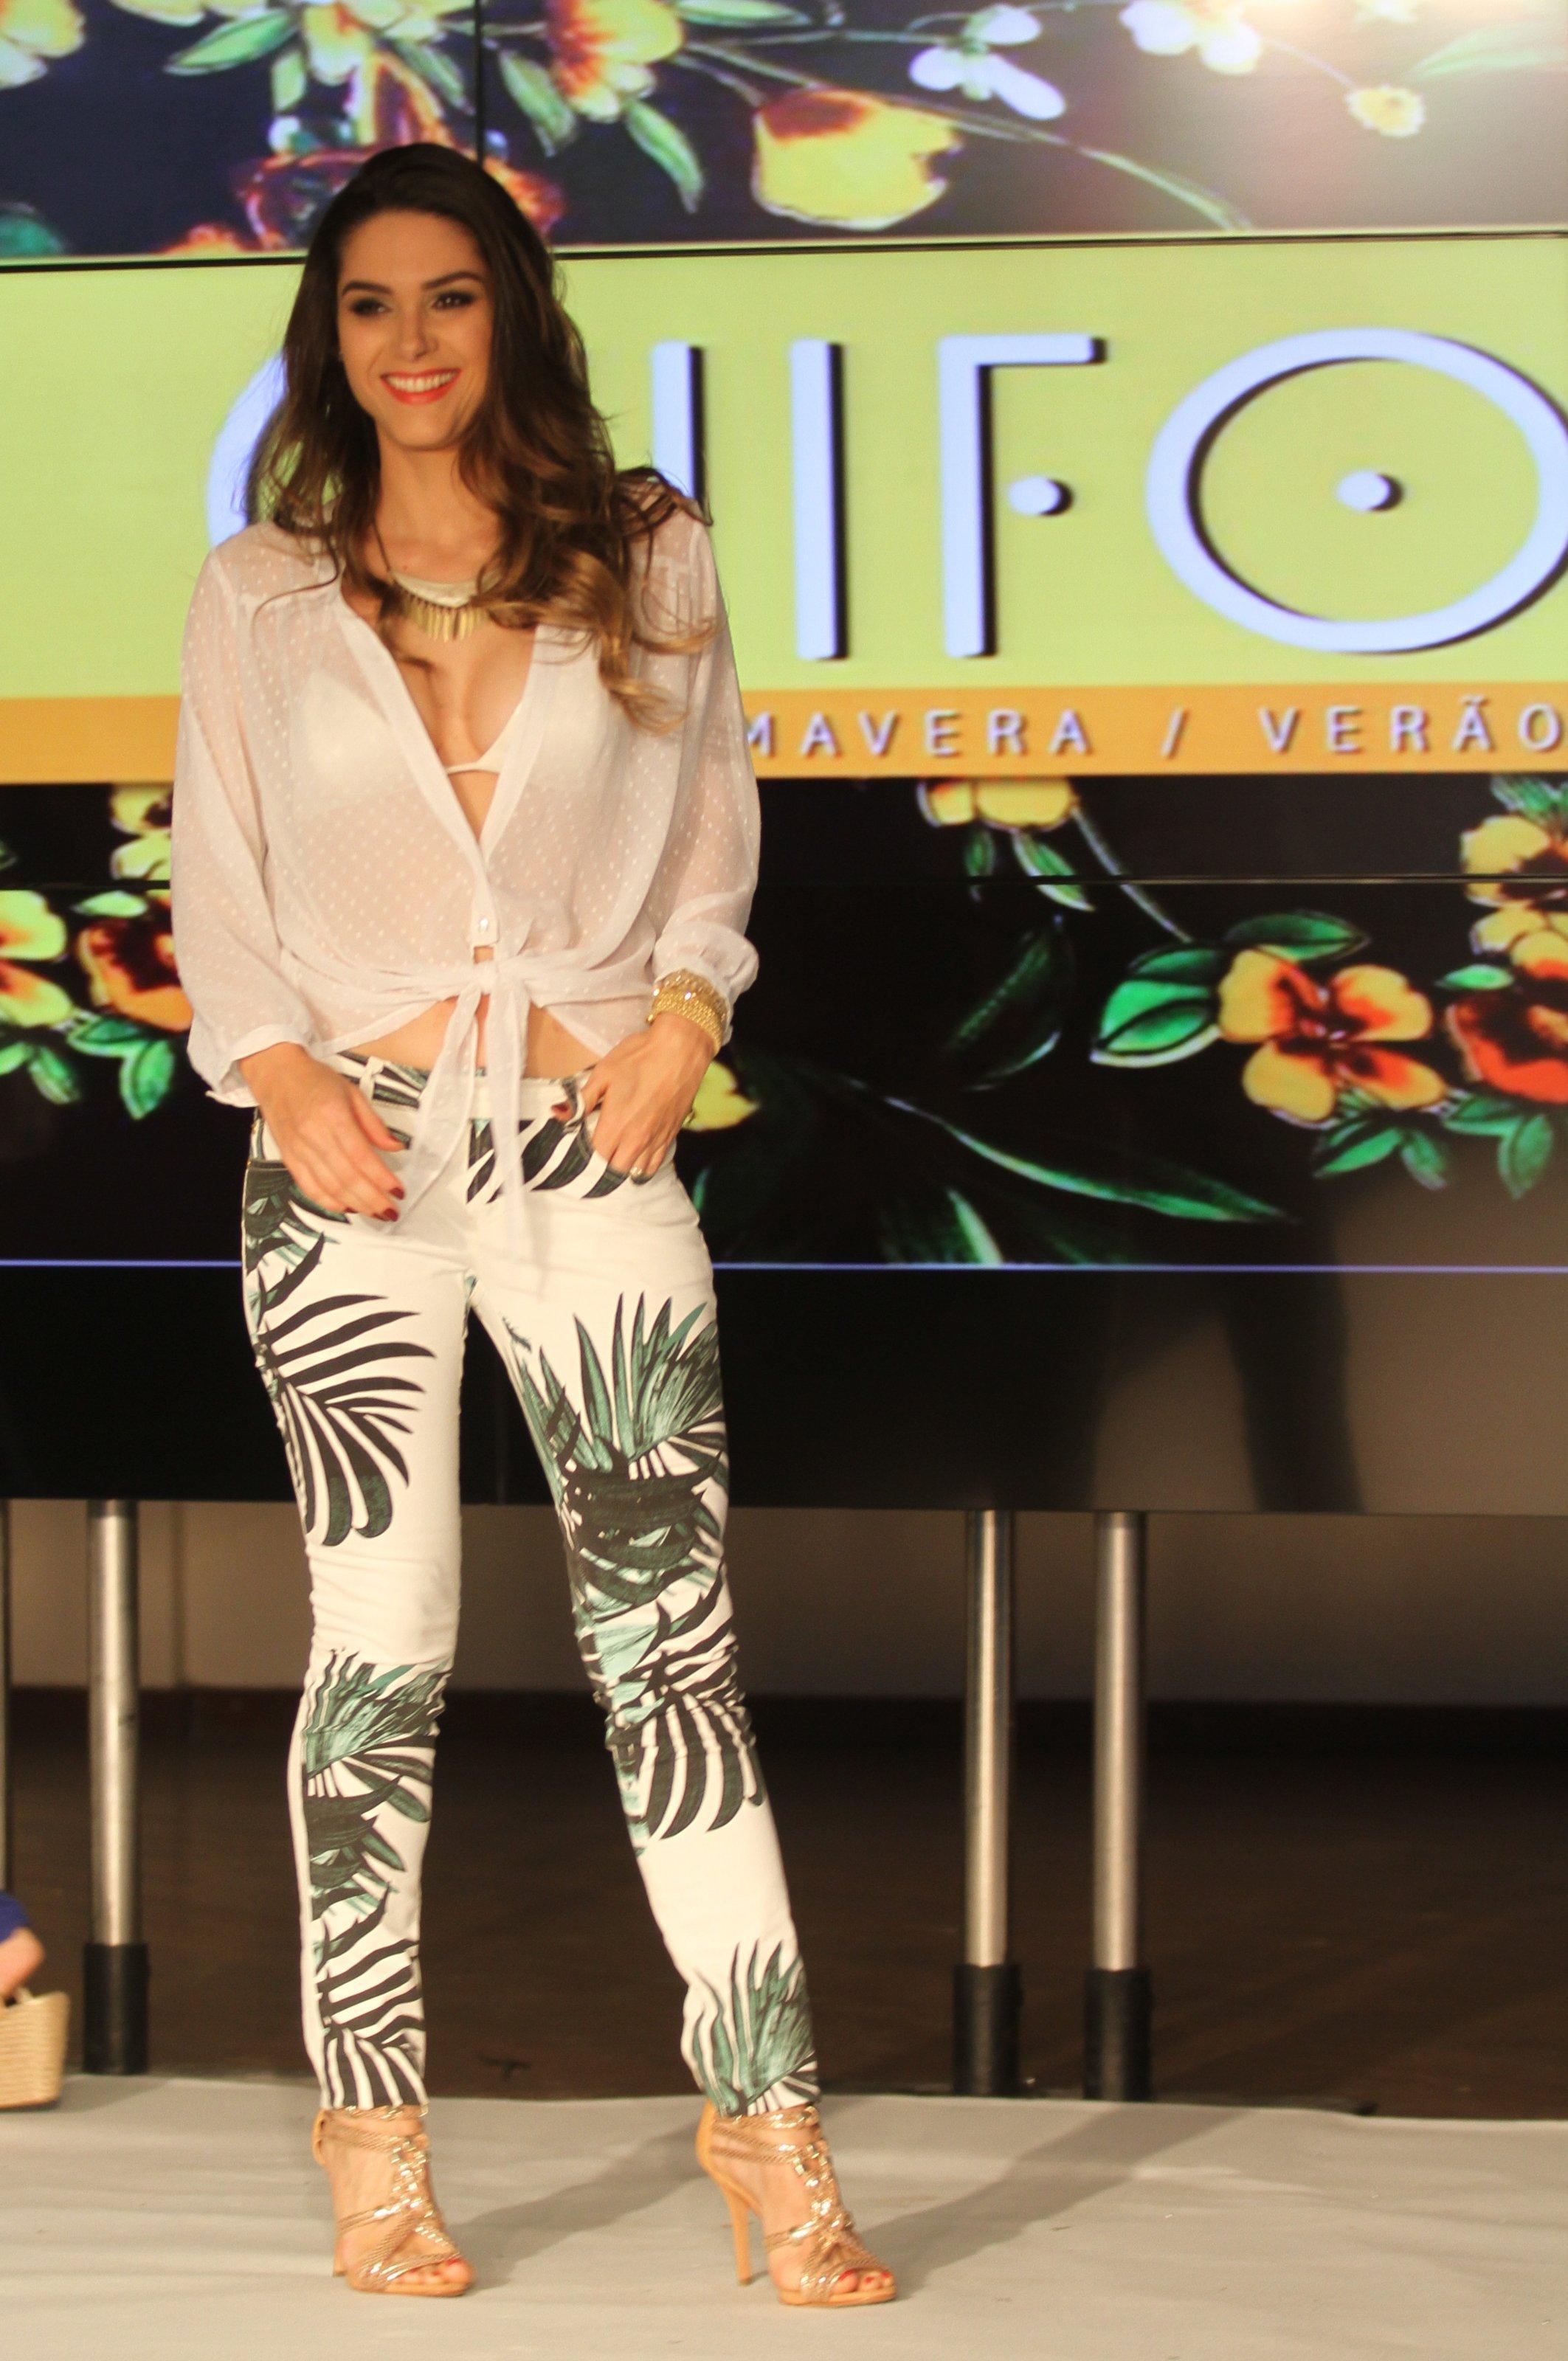 http://pics.wikifeet.com/Fernanda-Machado-Feet-1276721.jpg